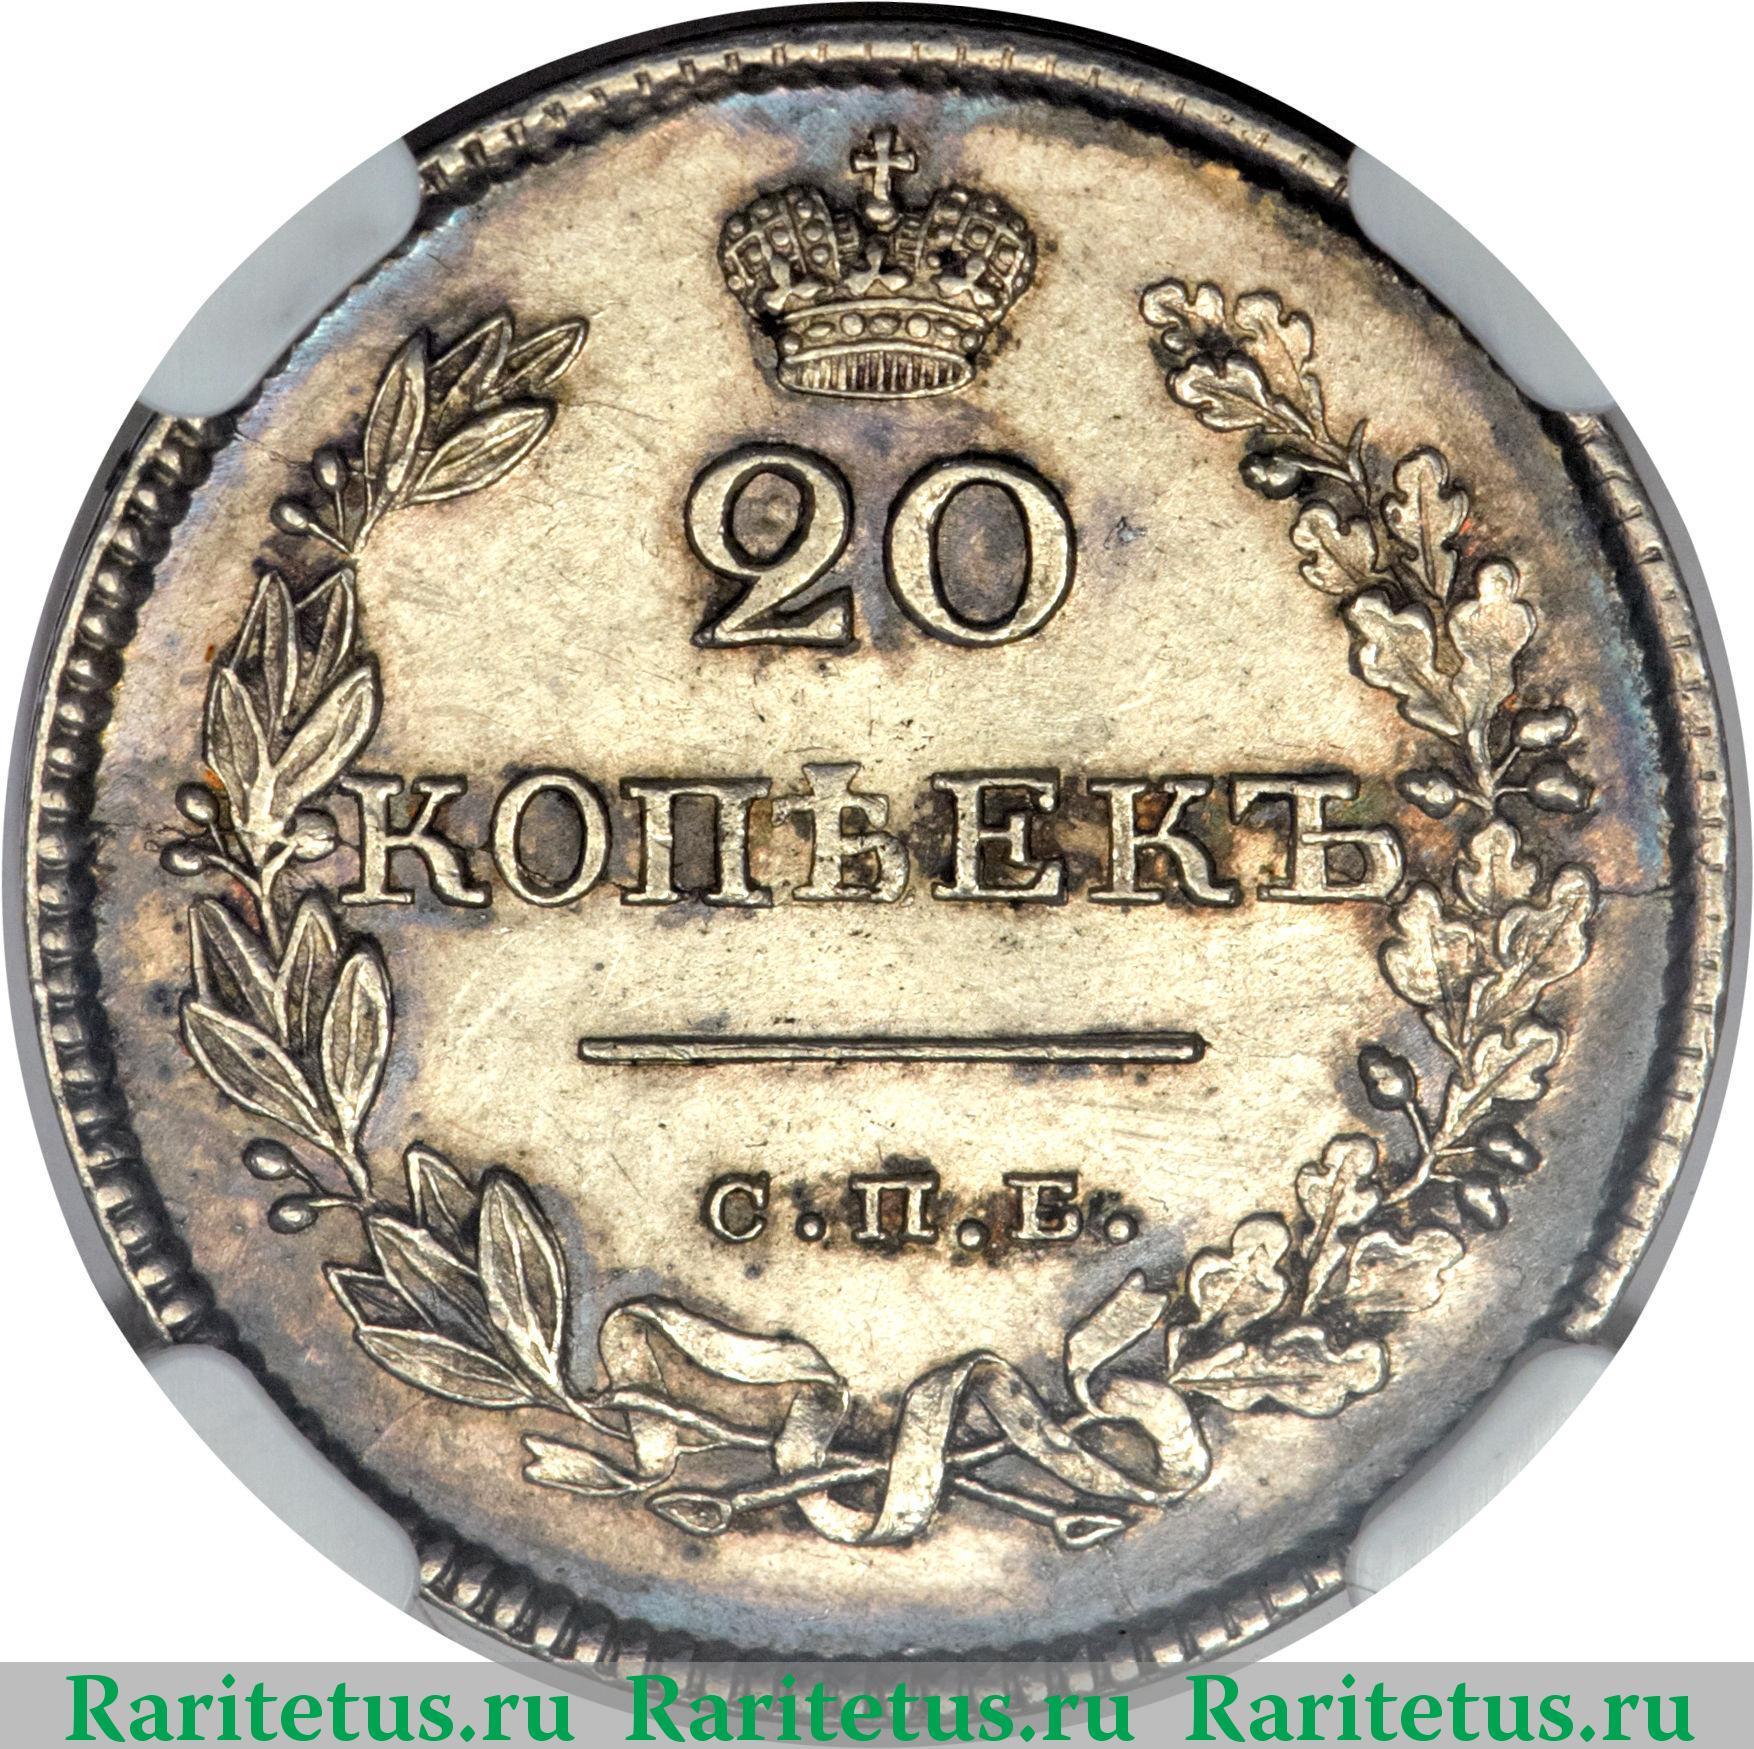 20 копеек 1826 10 рублей 1901 года цена золото